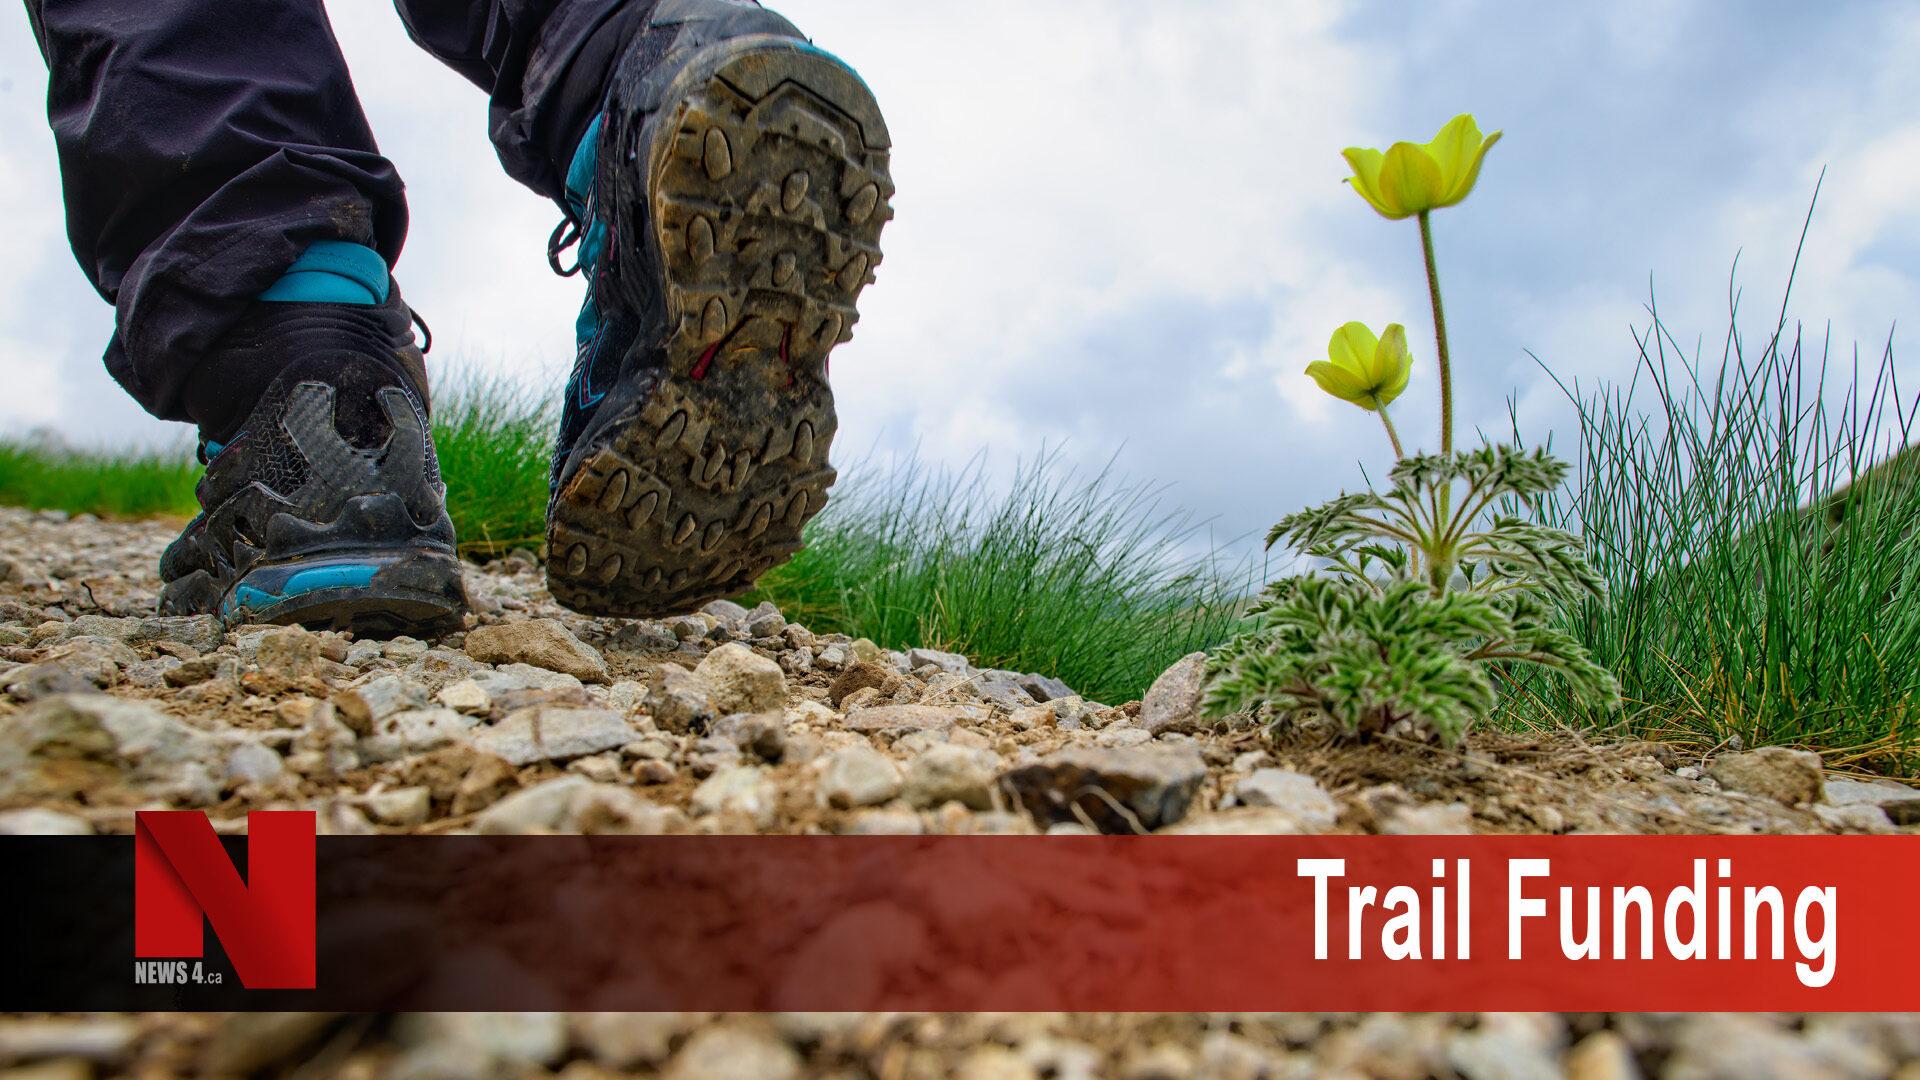 Trail funding